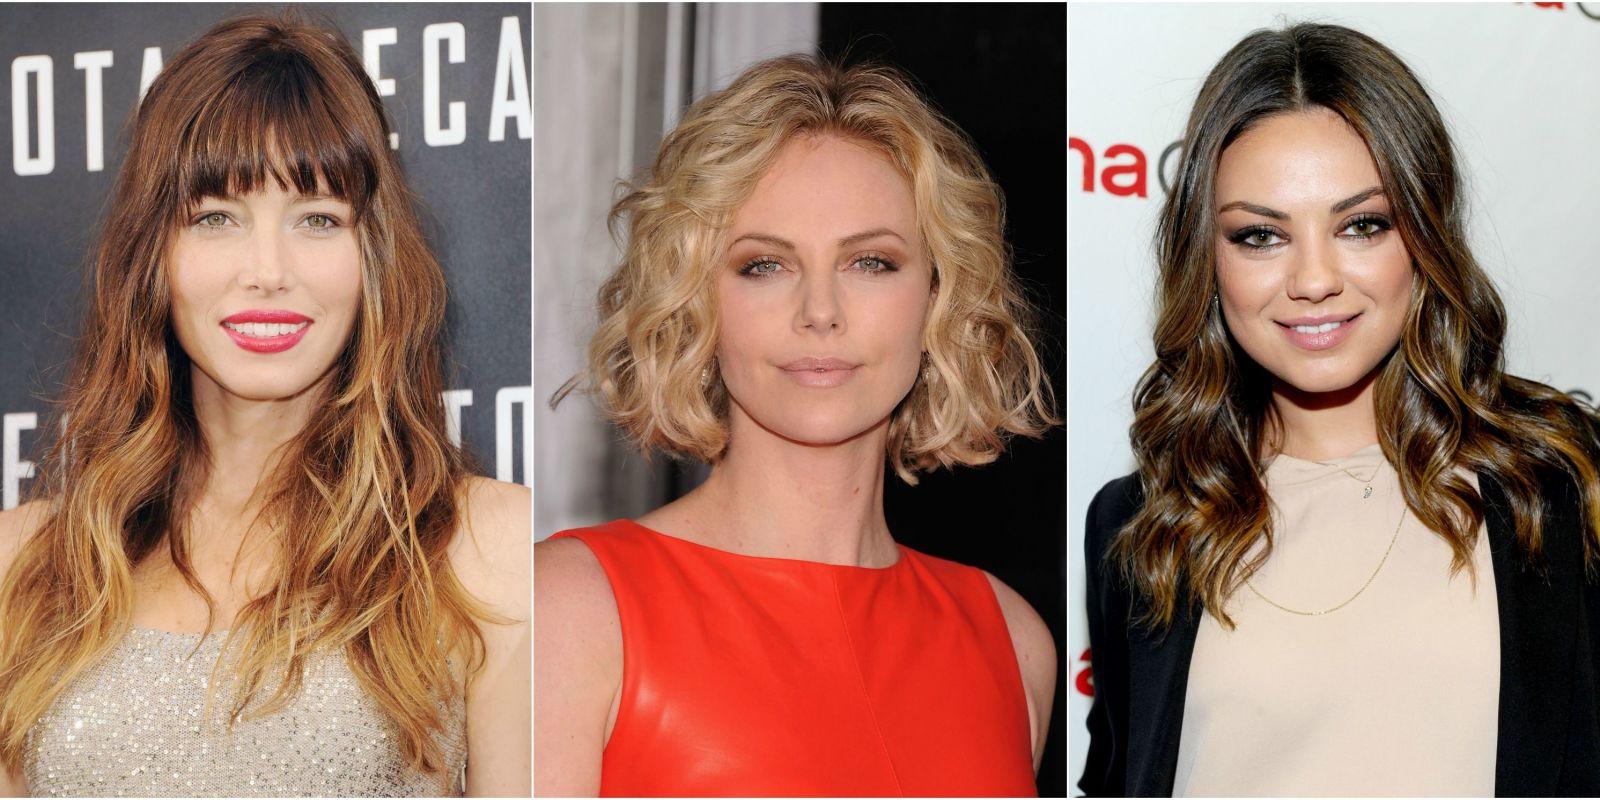 20 celebrity wavy hairstyles - best wavy hairstyles & cuts